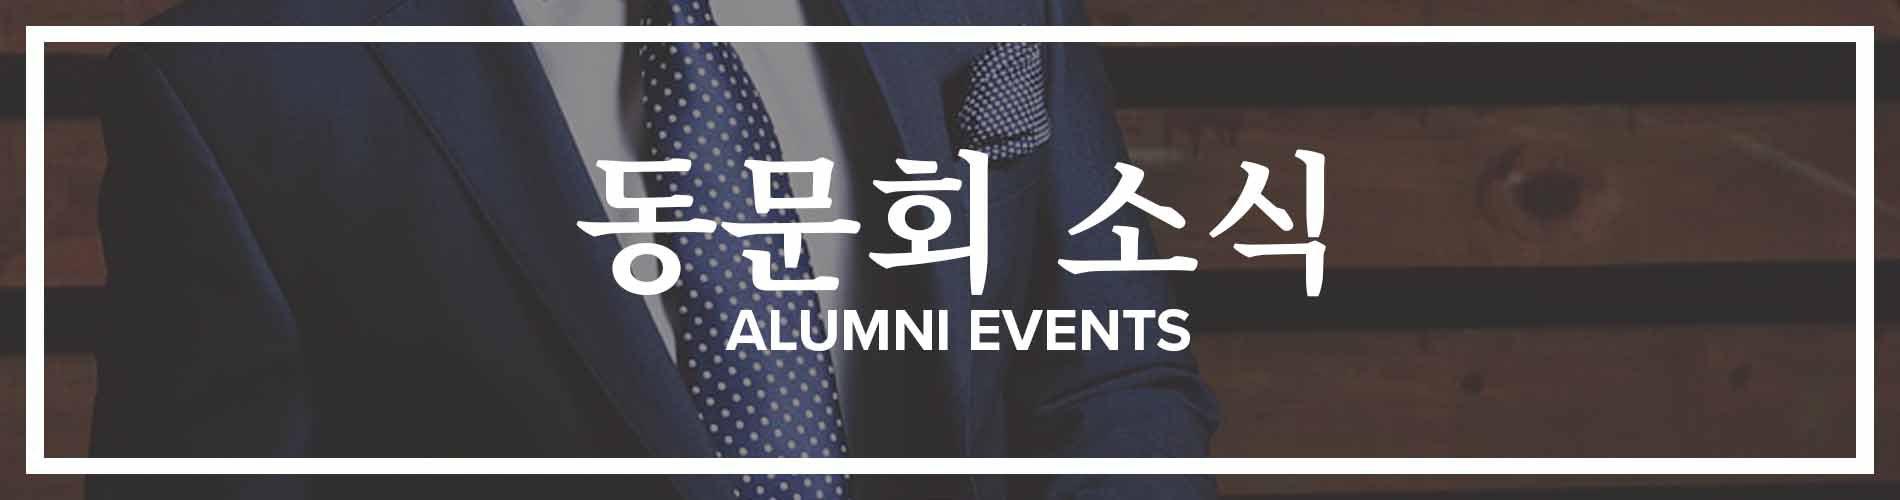 Alumni Events - Korean Banner